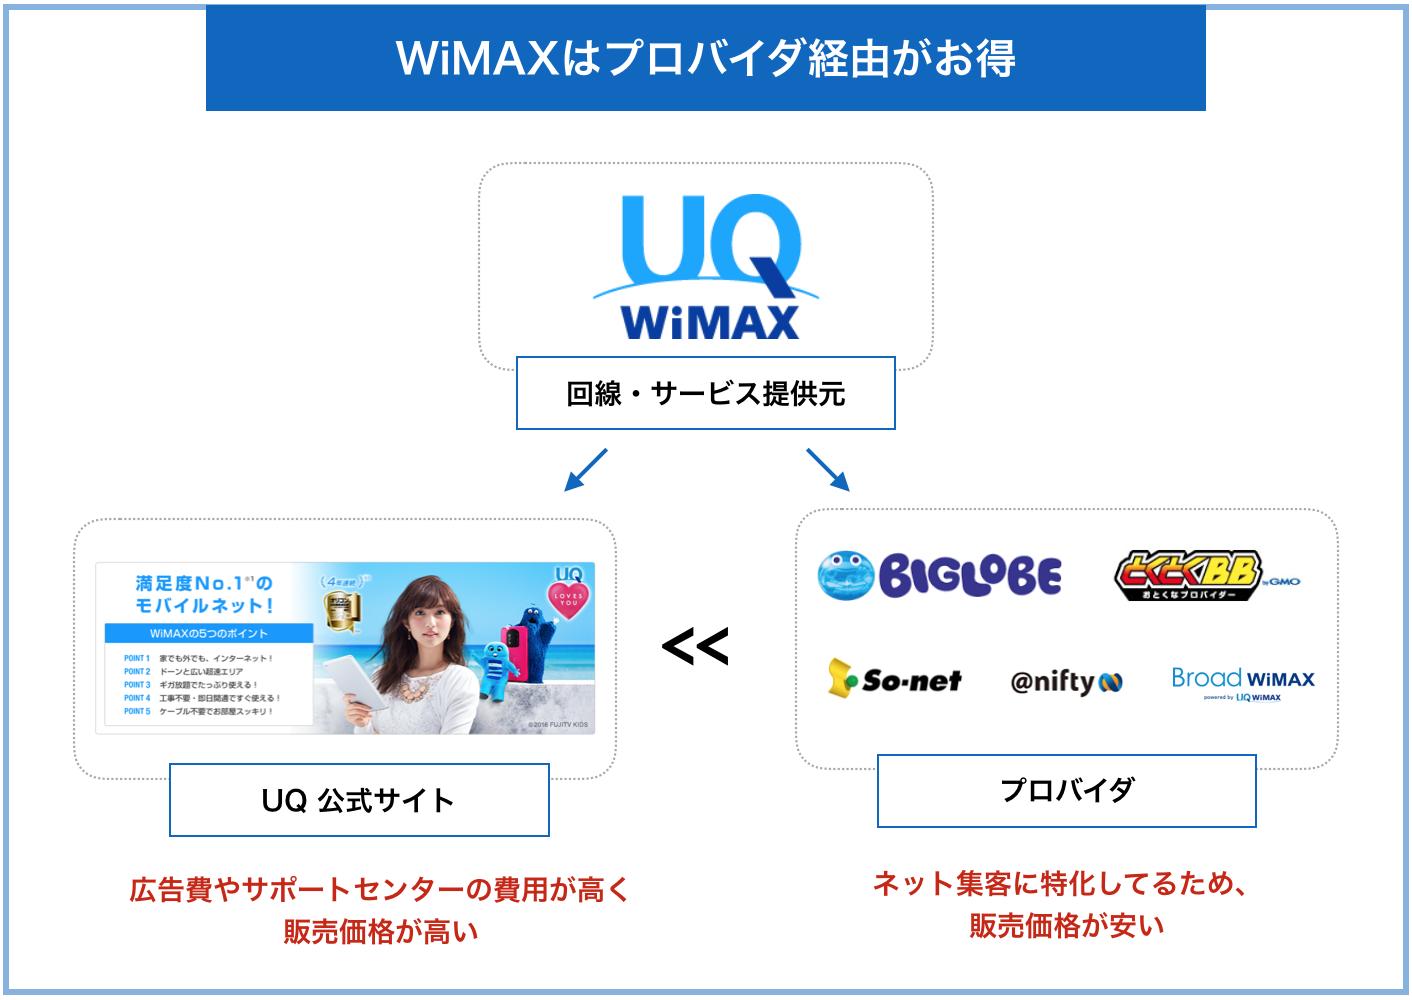 wimaxプロバイダと公式サイトの違い